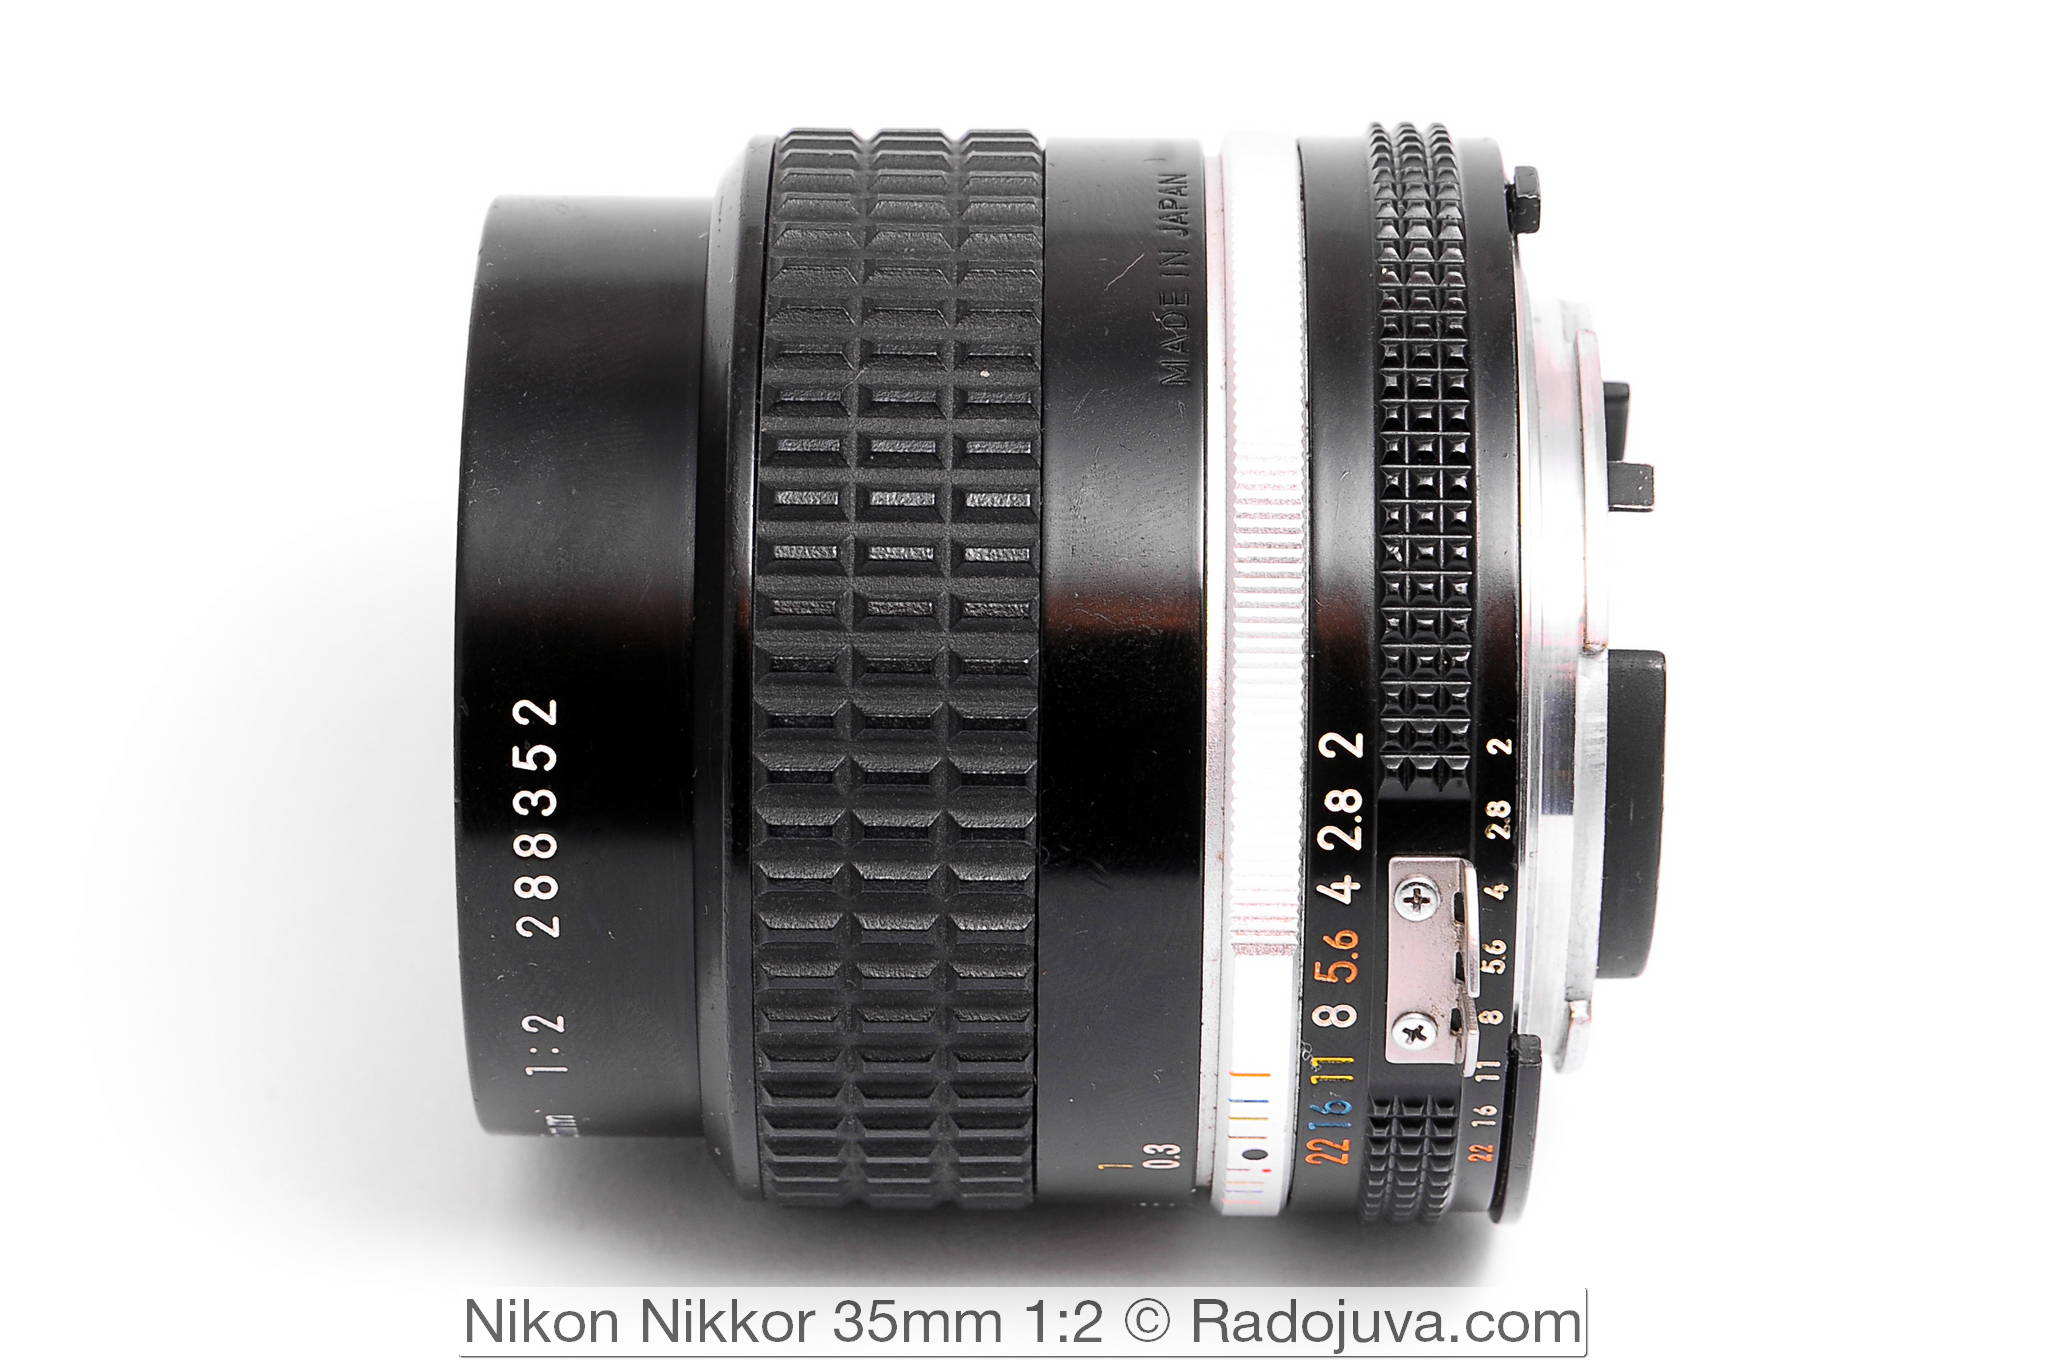 Nikon Nikkor 35mm 1:2 (AI-S)